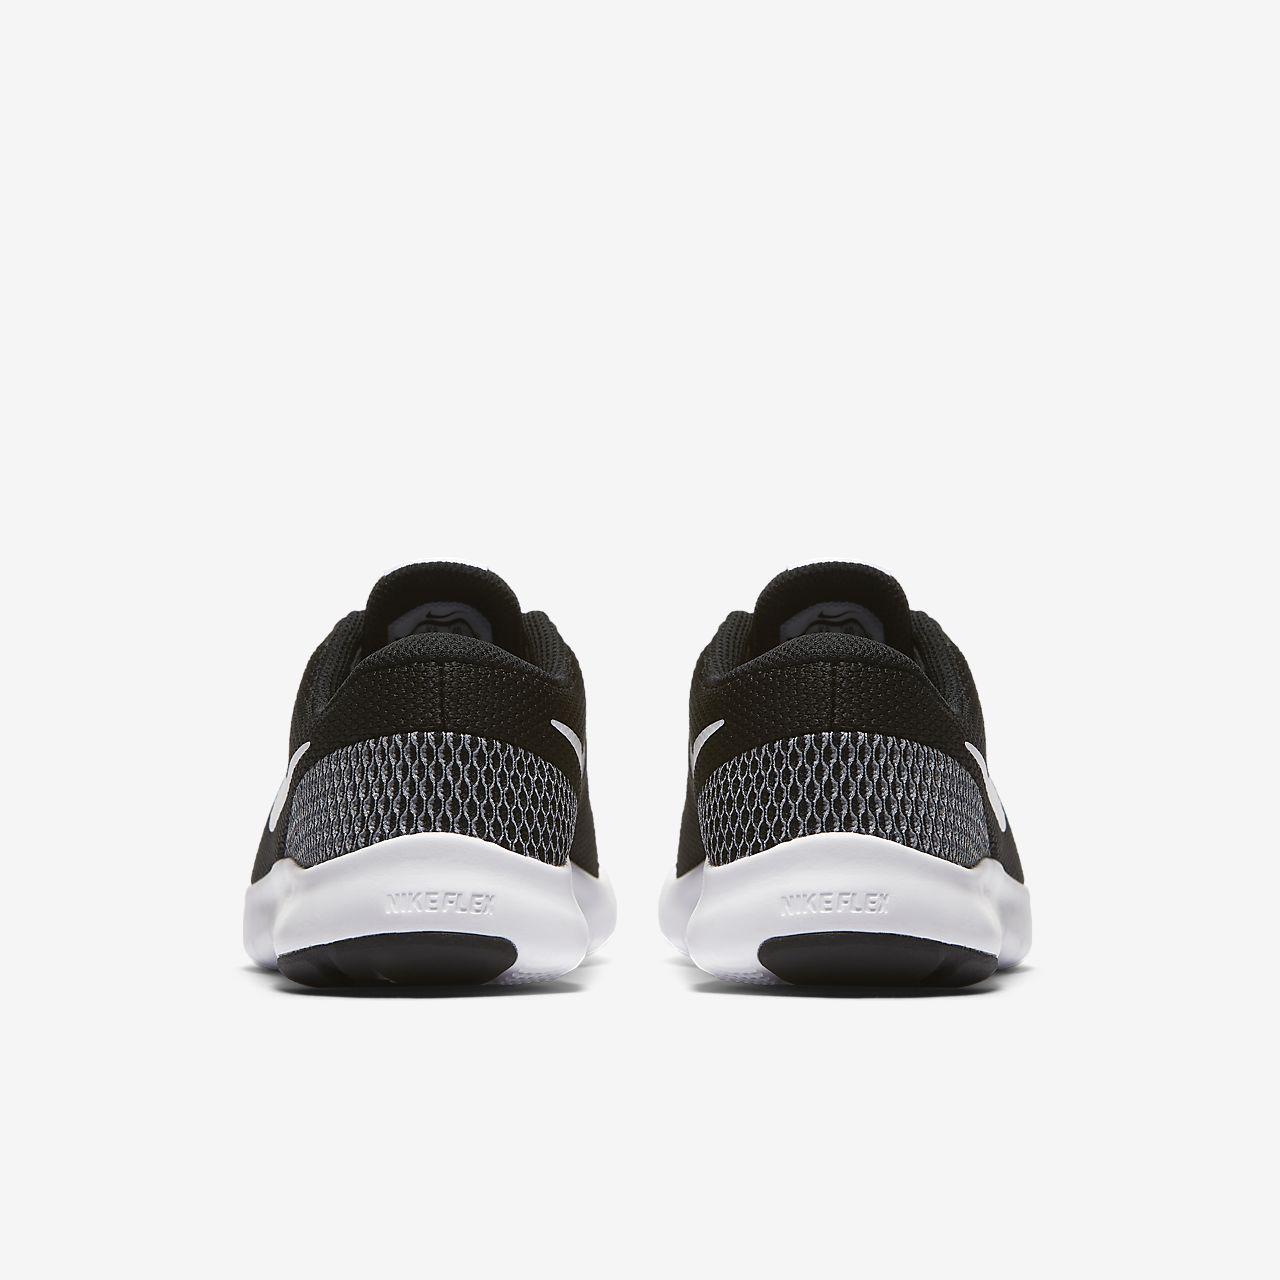 7d49330a5f190 Nike Flex Experience Run 7 Older Kids  Running Shoe. Nike.com LU